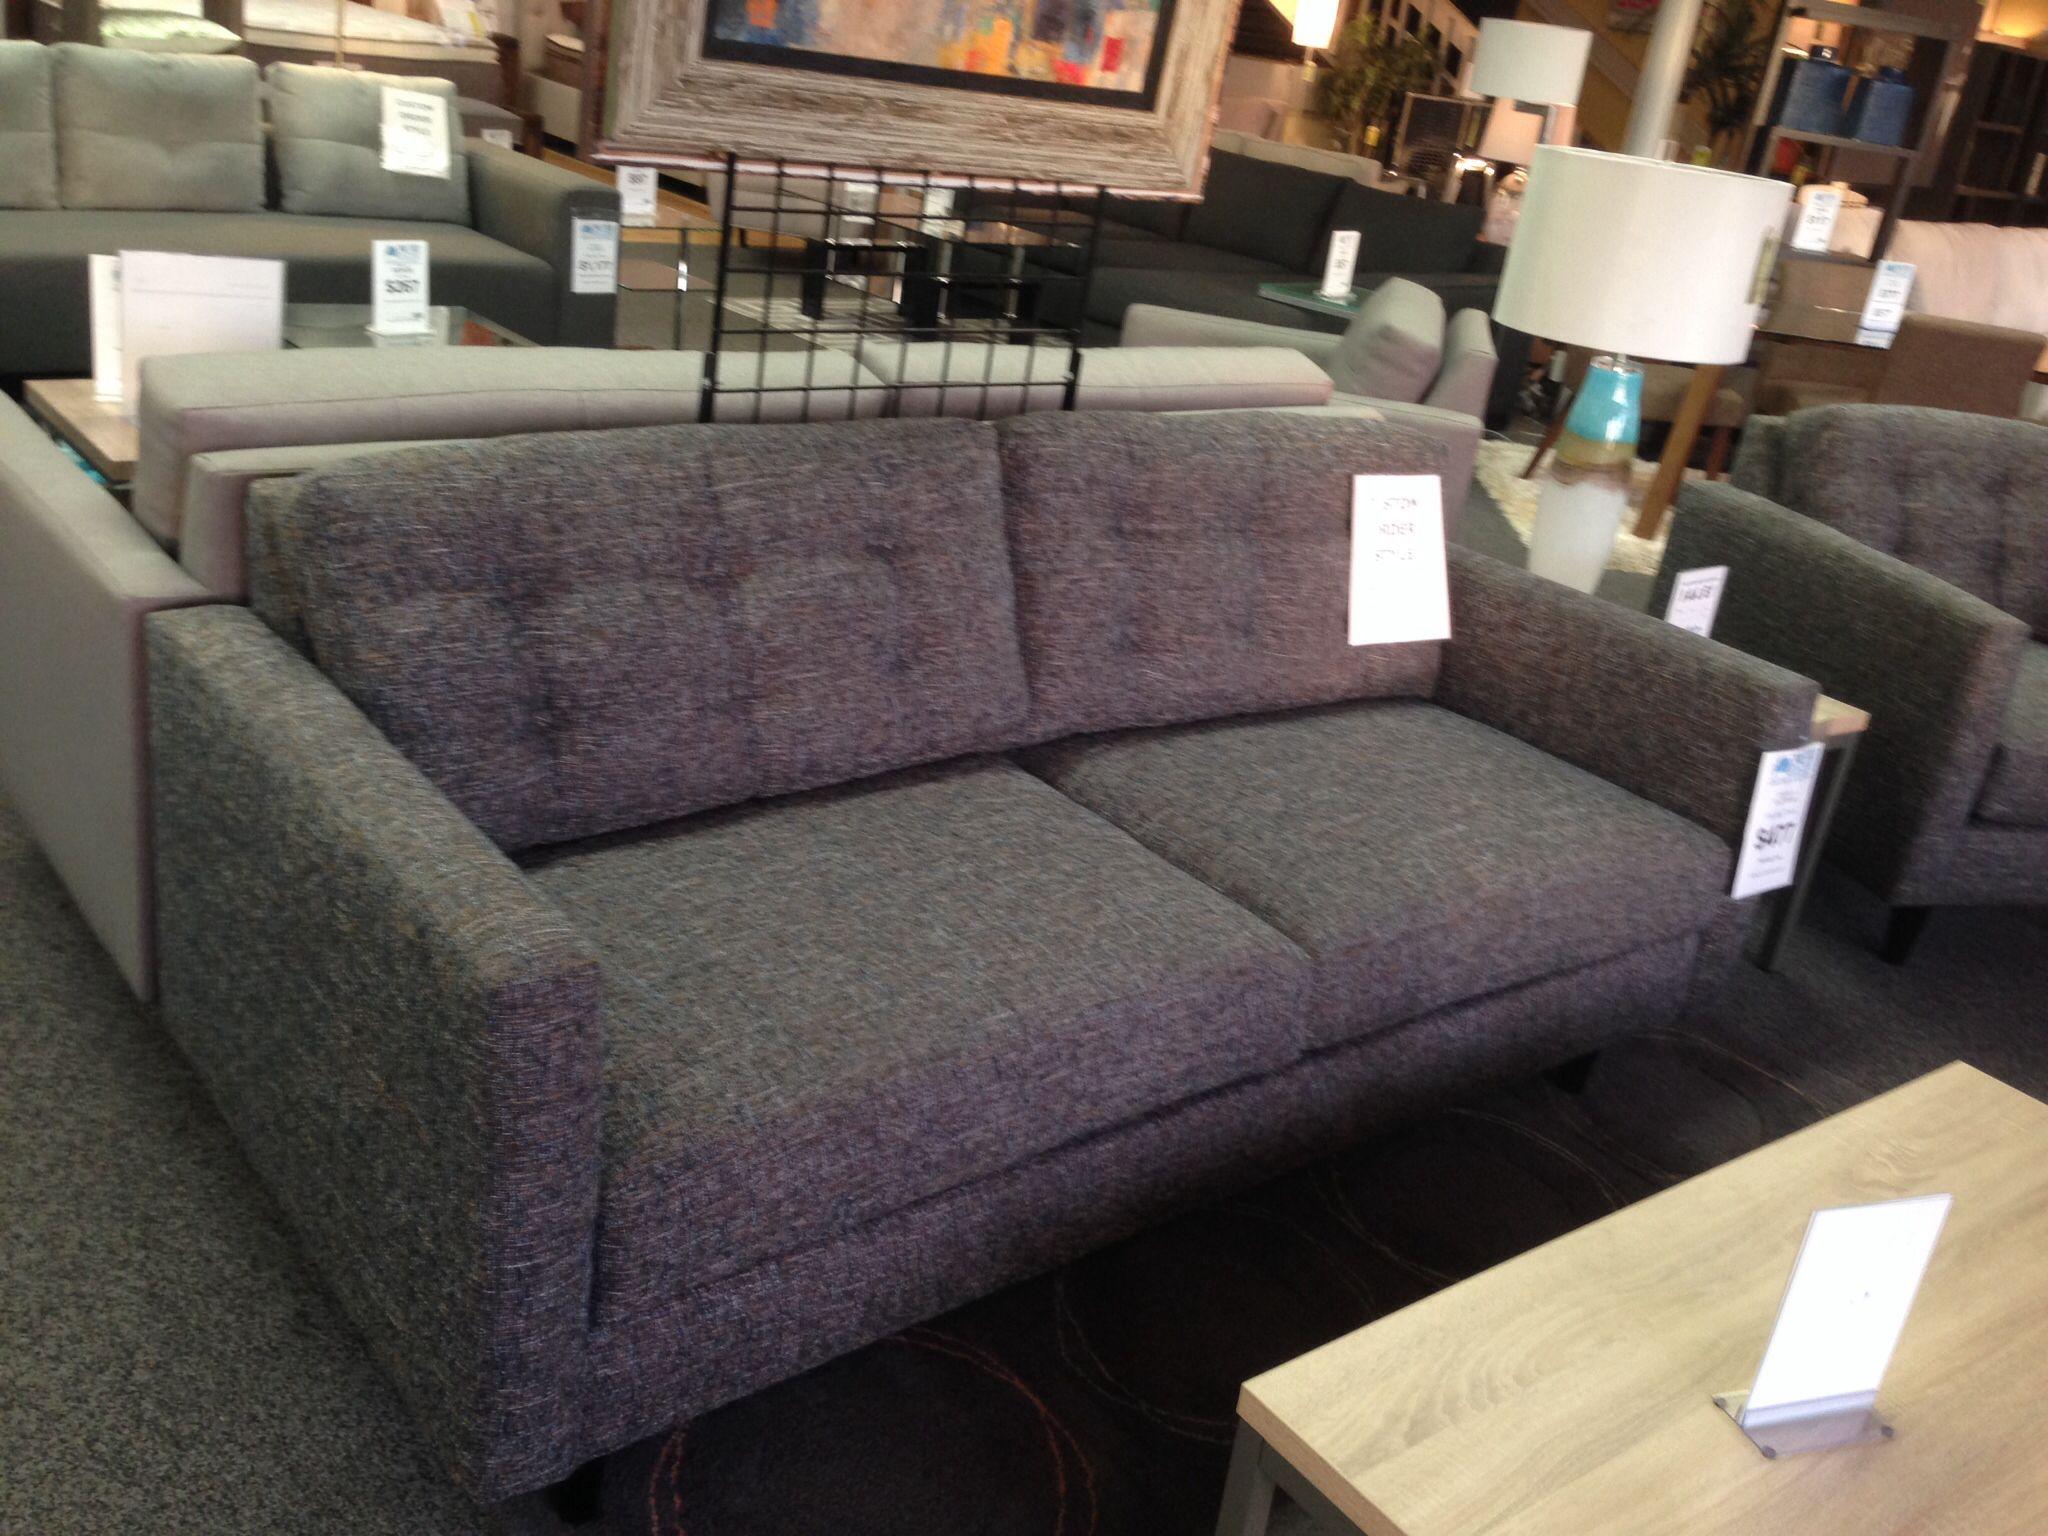 Etonnant Metro Decor San Diego Custom Fabric Sofa And Chair, Mid Century Modern  Style. Very Comfy!